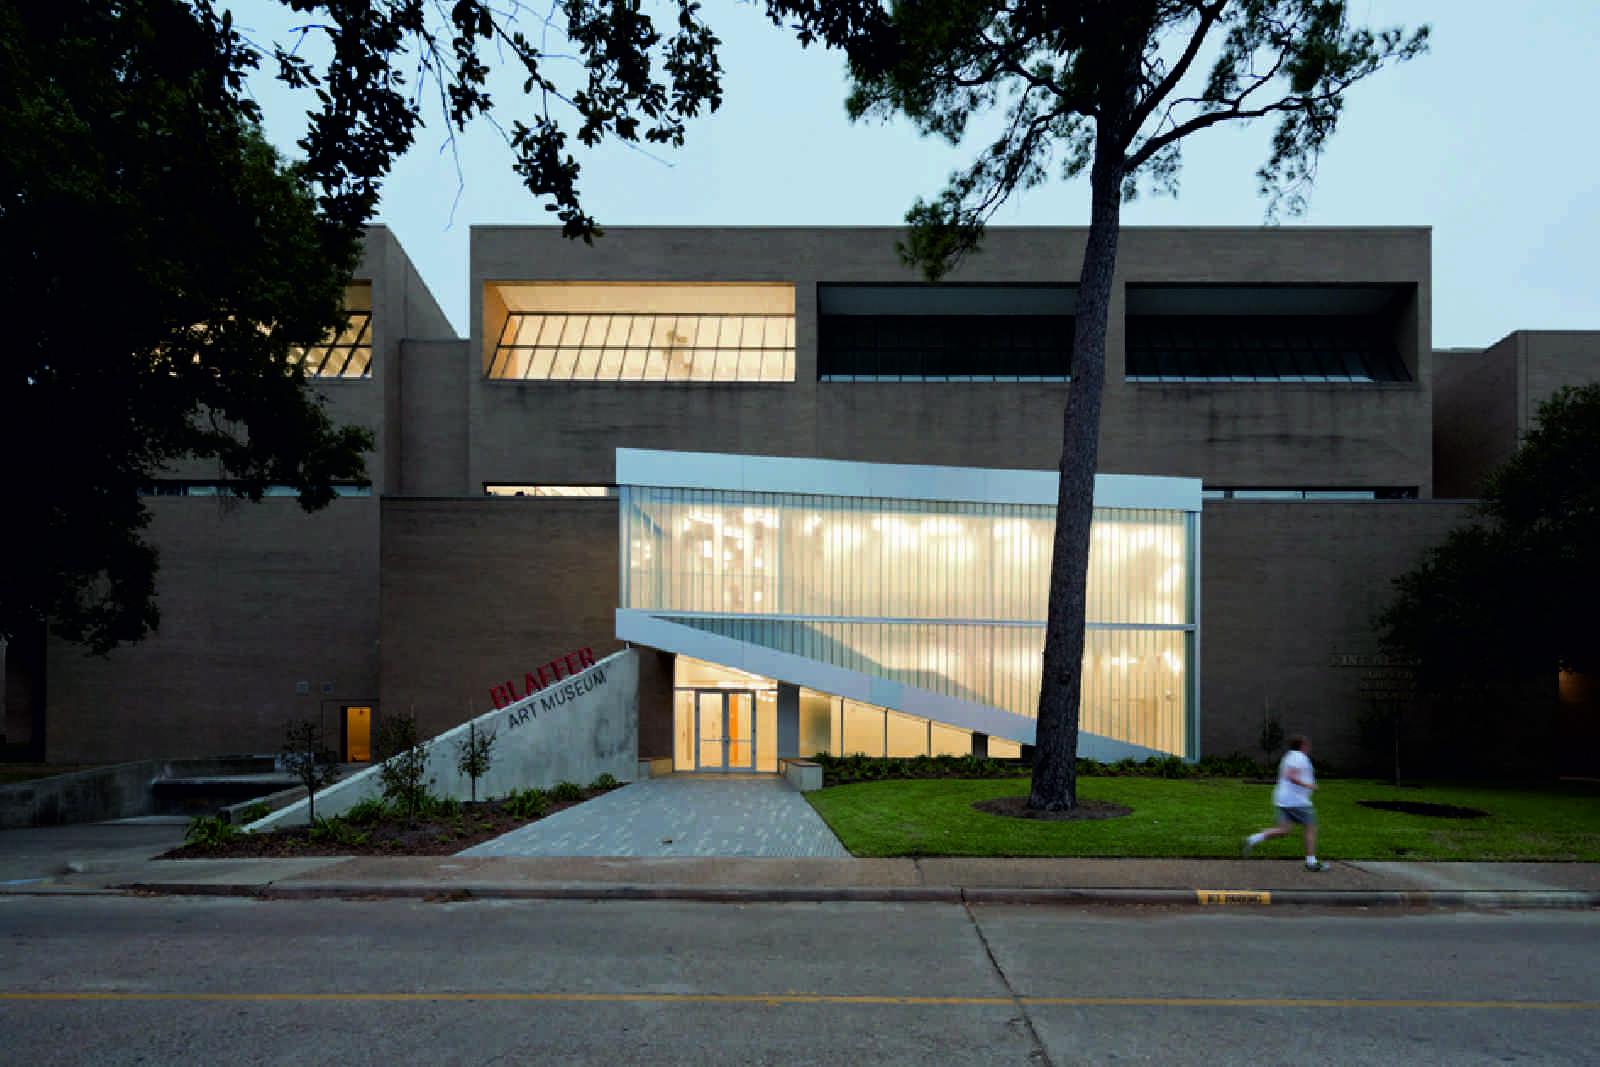 Atelier D Architecture Alexandre Dreyssé blaffer art museumworkac – aasarchitecture